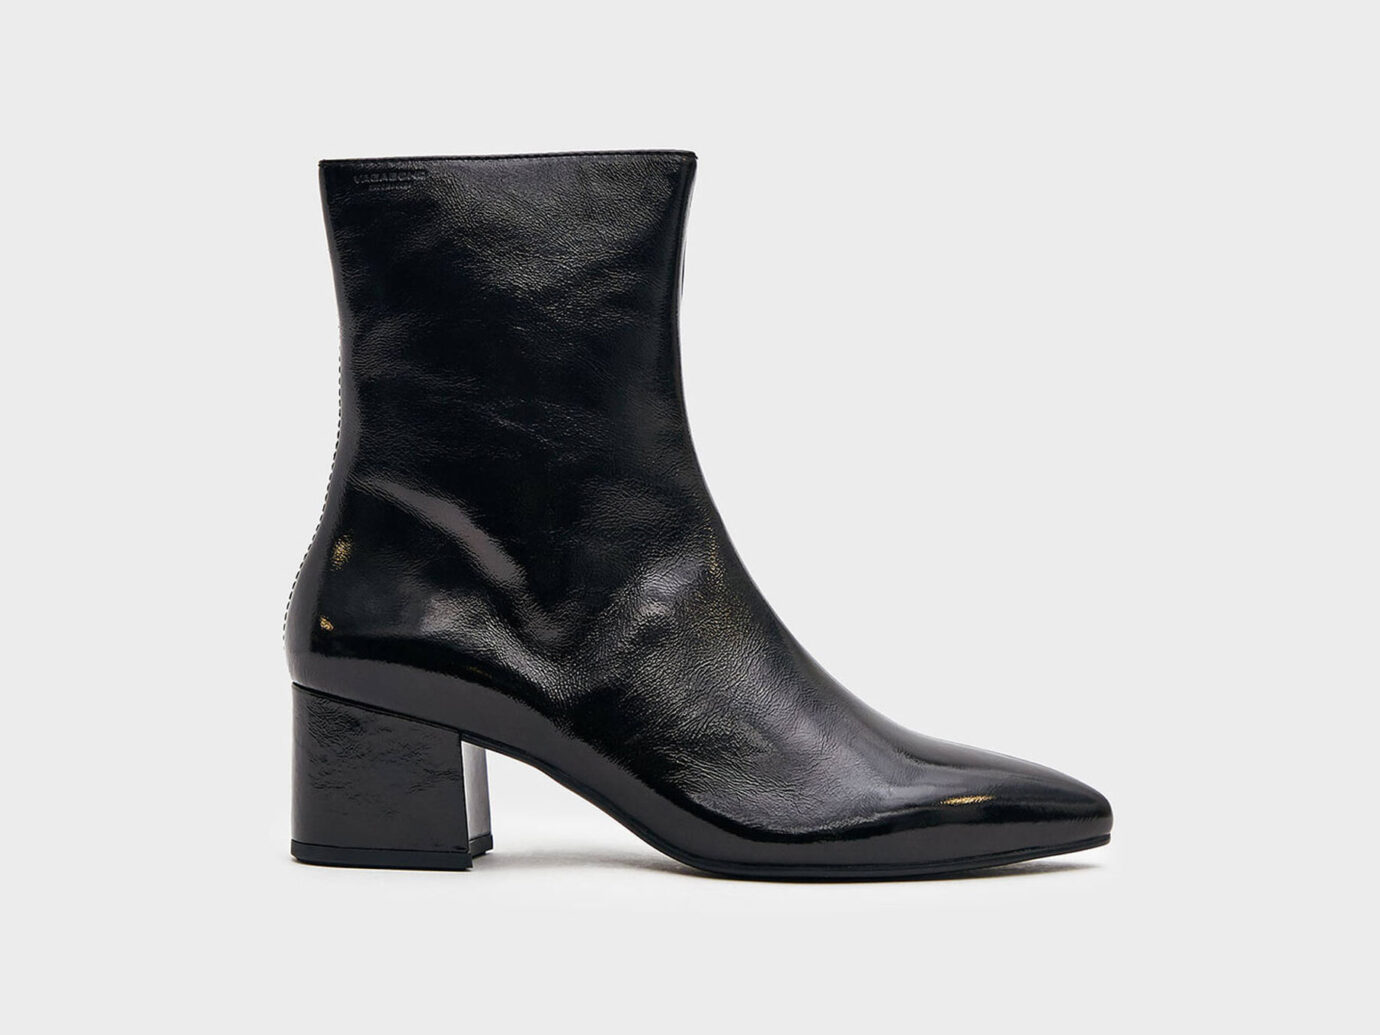 Vagabond Mya Patent Boot